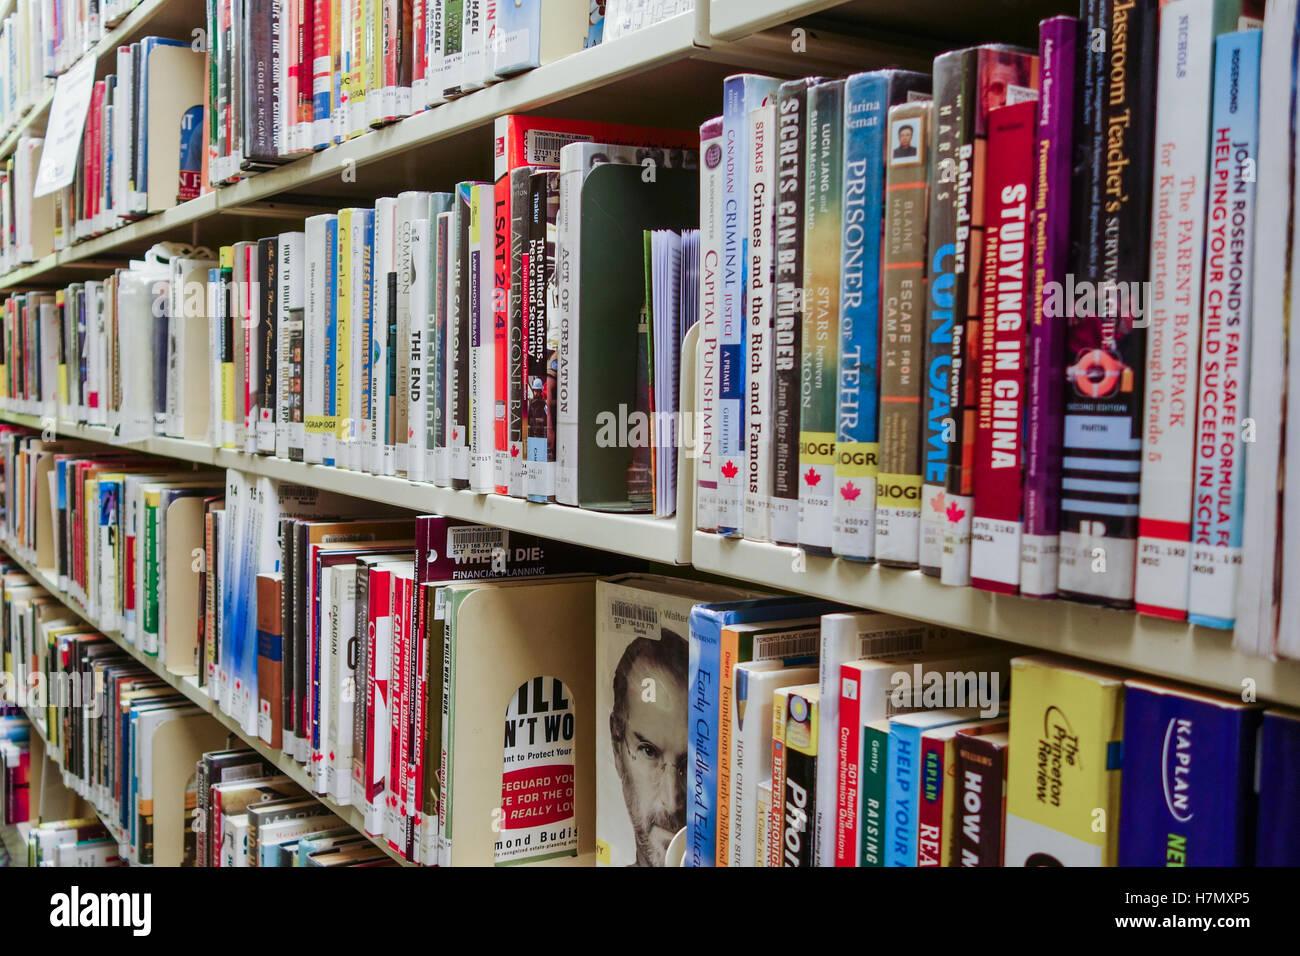 library bookshelf - Stock Image